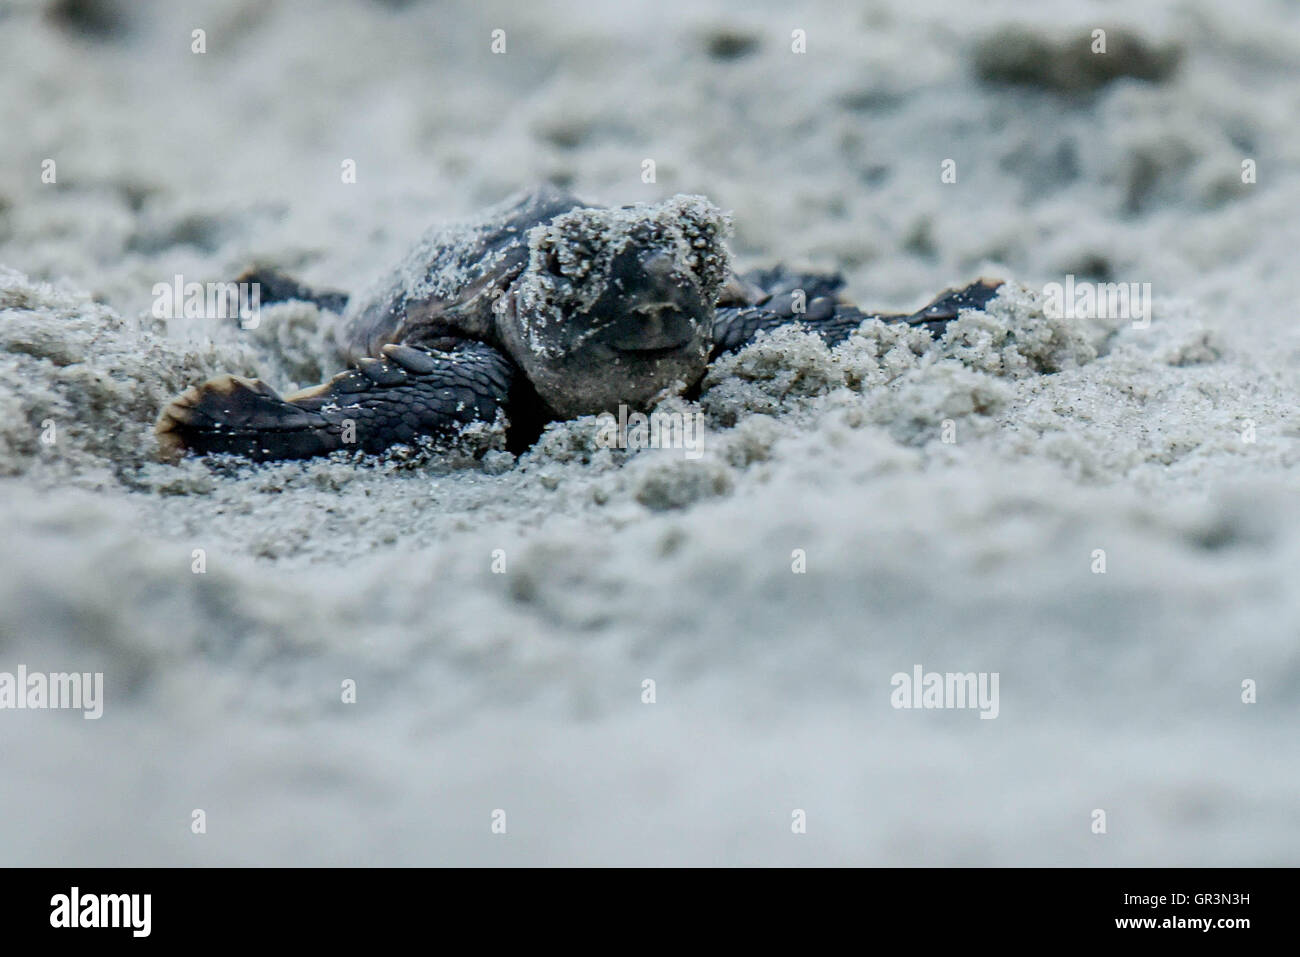 Baby Loggerhead turtle hatching - Caretta caretta   North Carolina - Sunset Beach   Endangered young turtles climb - Stock Image